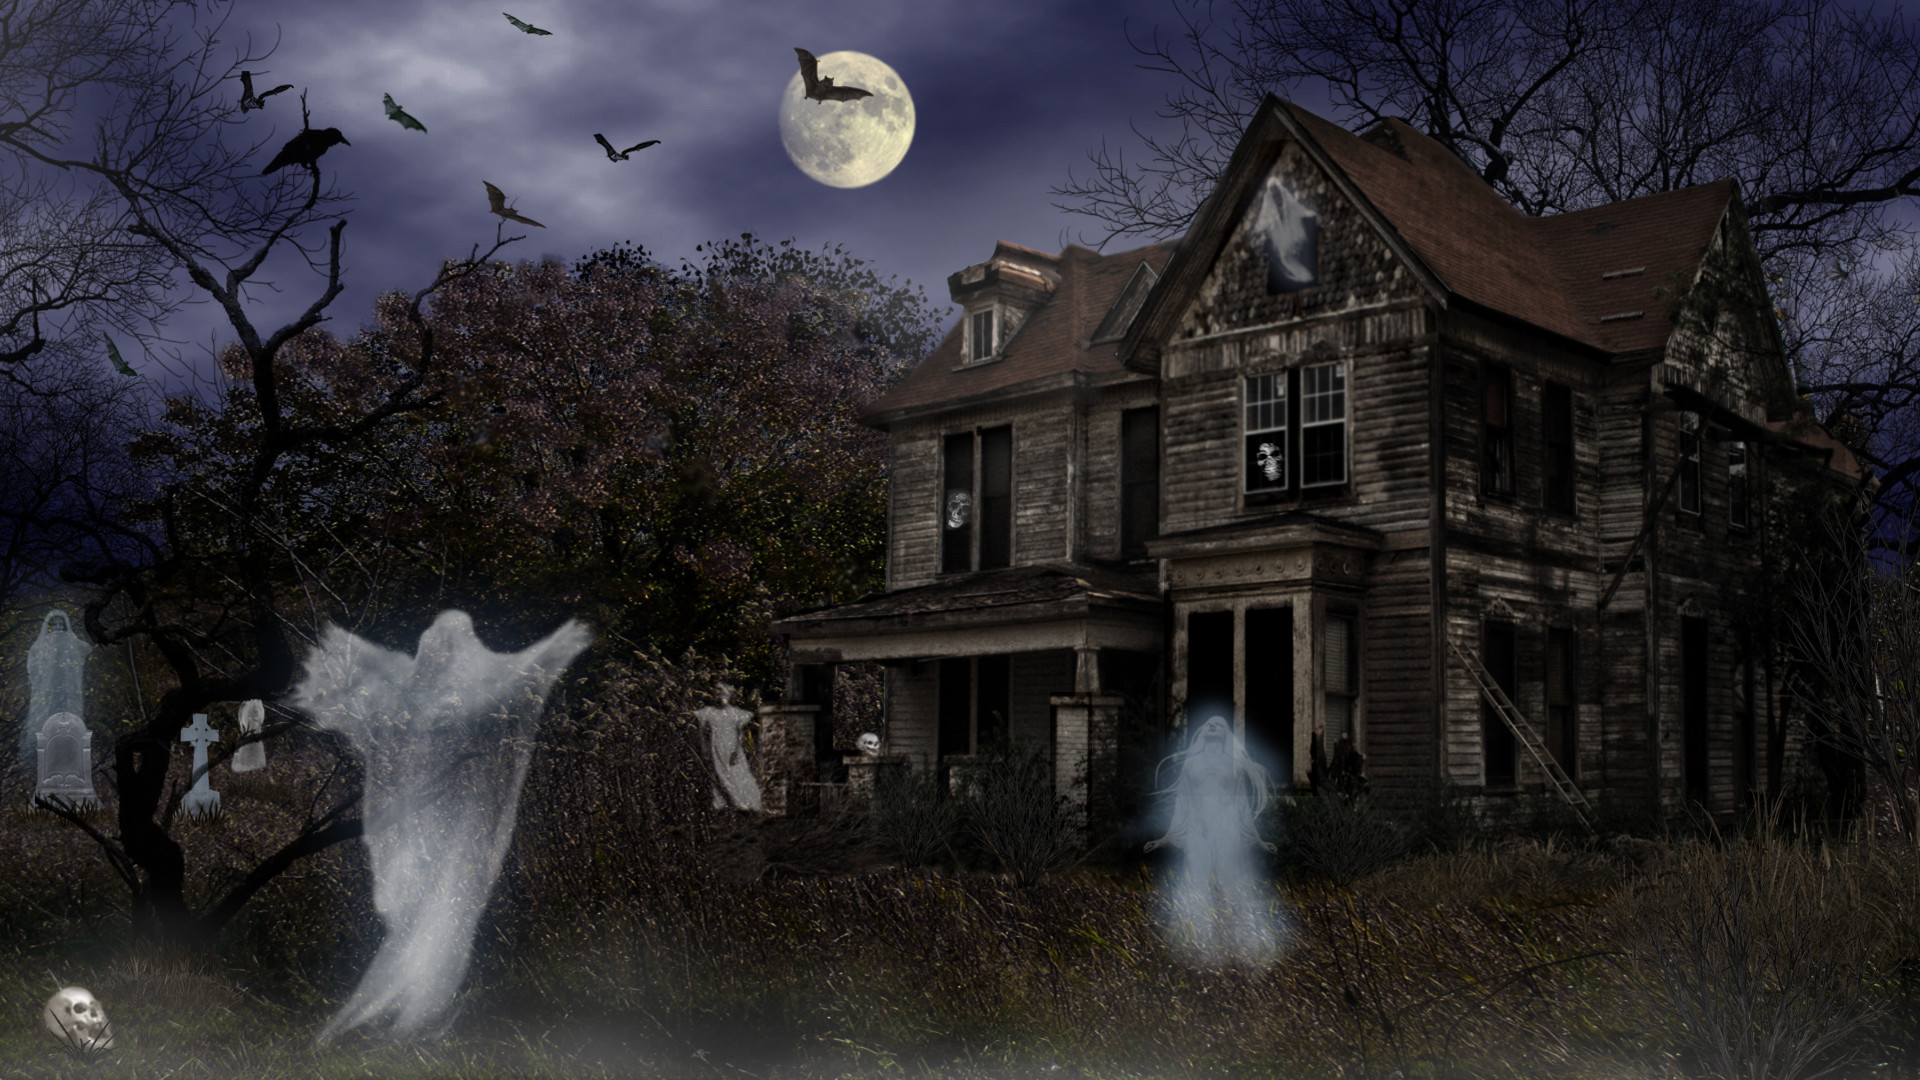 Screensavers Explore Haunted Mortuary Halloween wallpapers HD free .